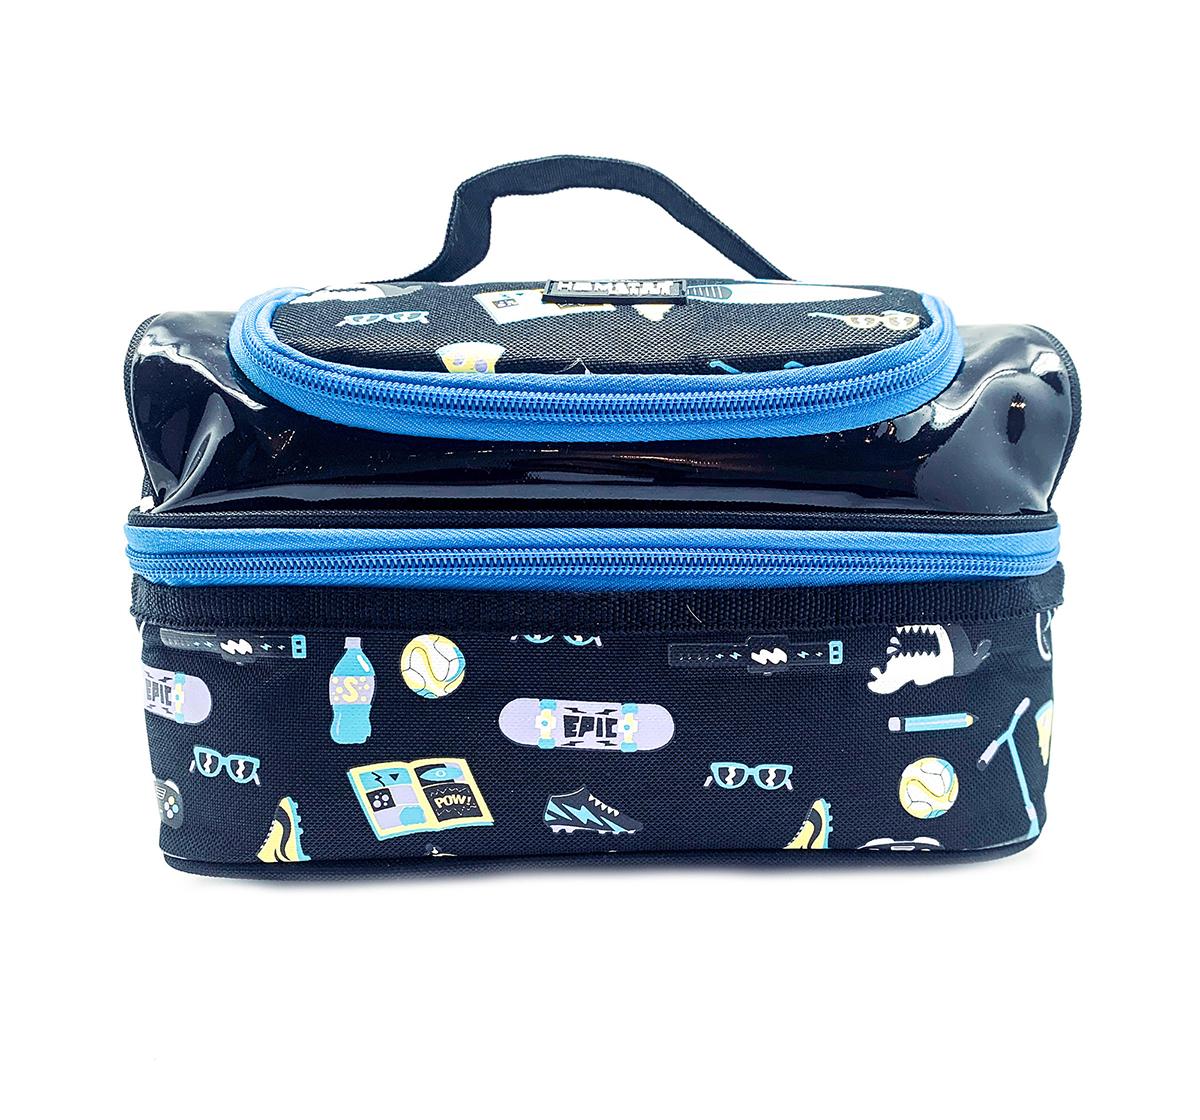 Hamster London | Hamster London Beach Theme Lunch Bag for Kids age 3Y+ (Black)